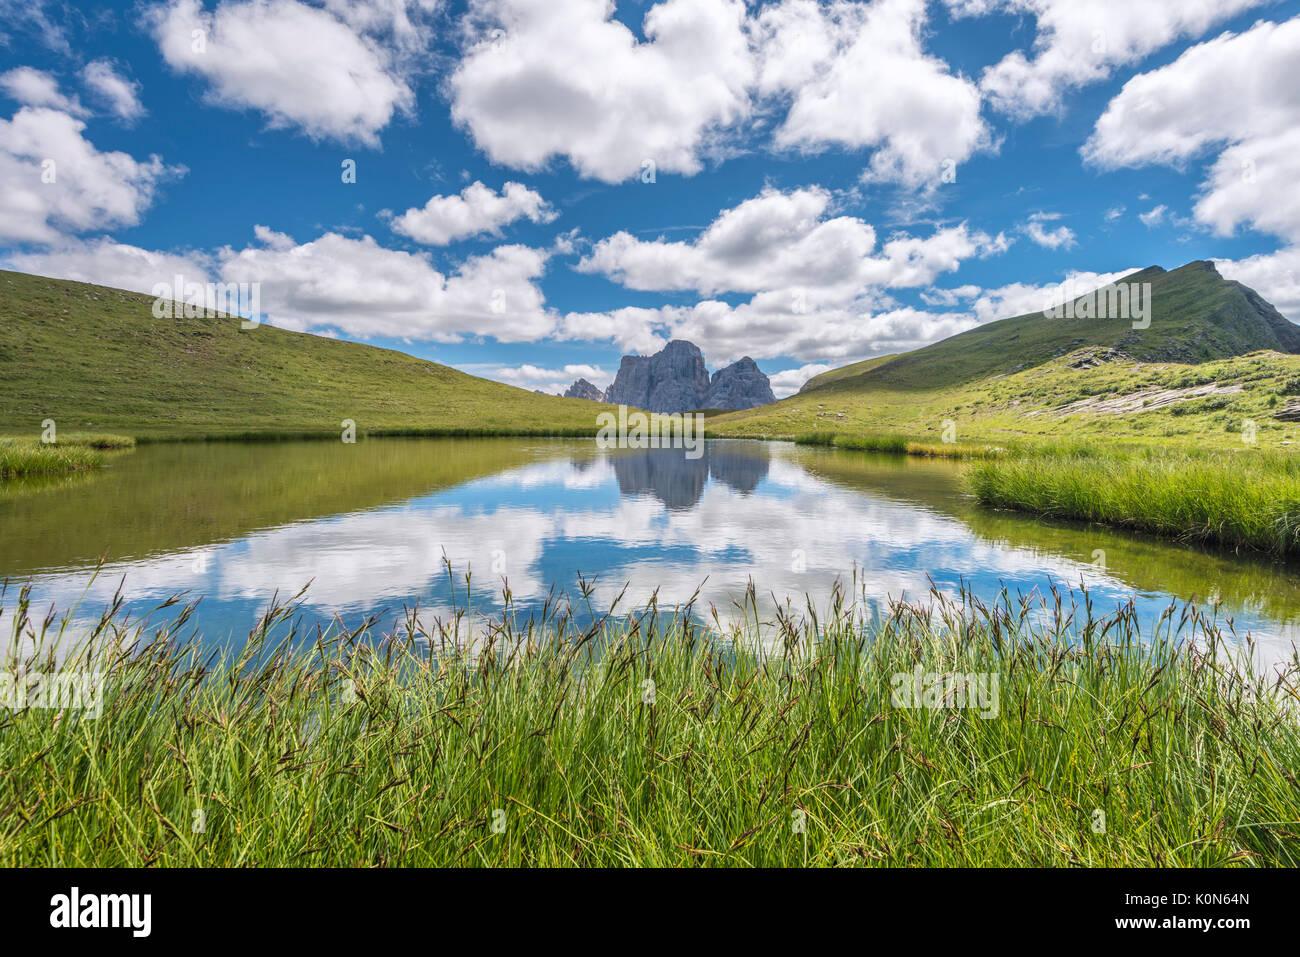 Mondeval, Dolomites, Cortina d'Ampezzo, Veneto, Belluno, Italy - Stock Image